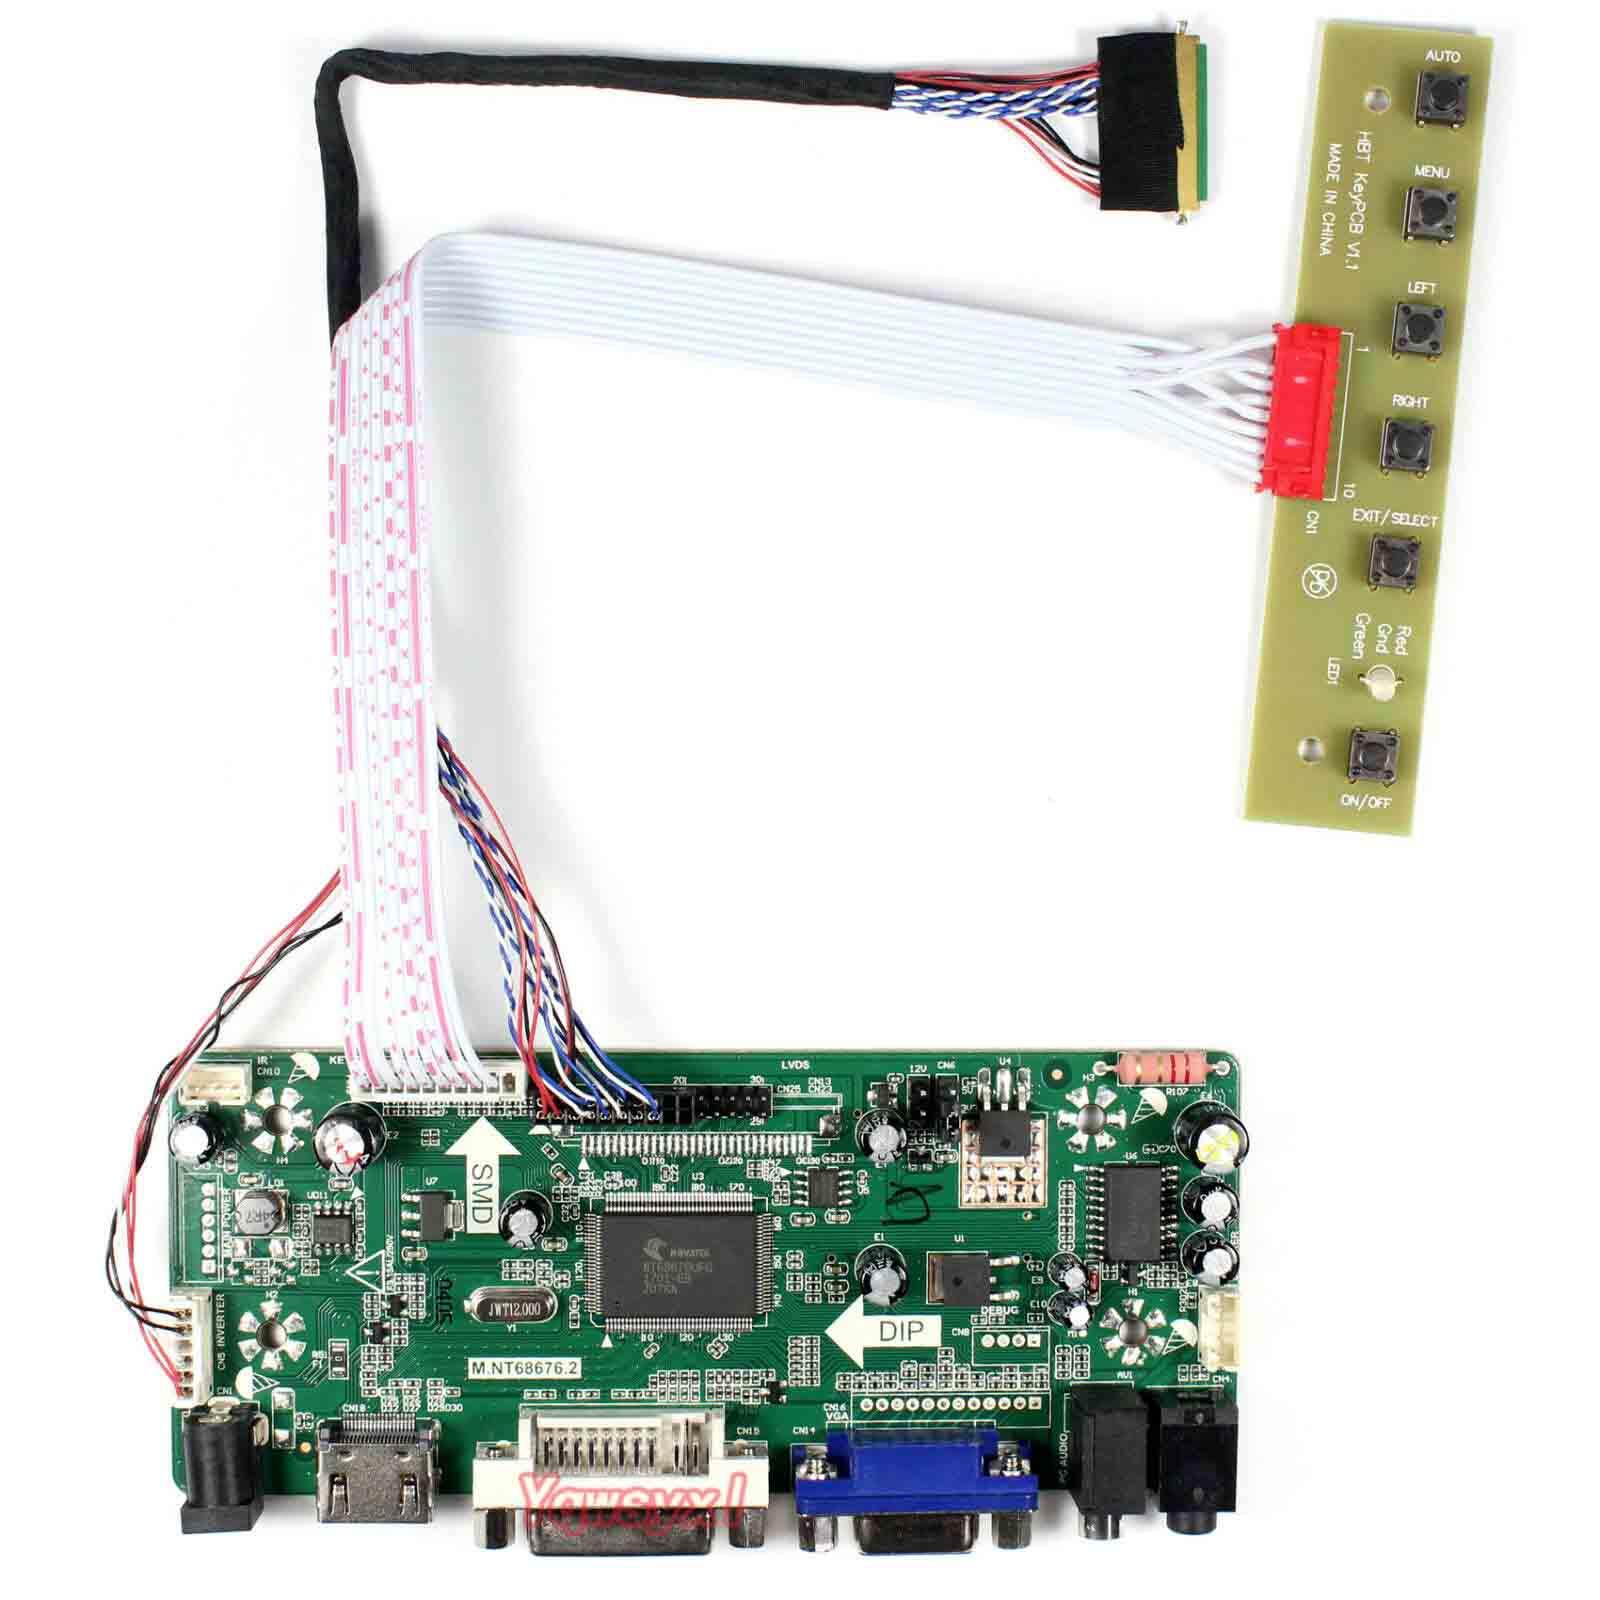 Yqwsyxl Control Board Monitor Kit For N133B6-L01  N133B6-L02  HDMI+DVI+VGA LCD LED  Screen  Controller Board Driver